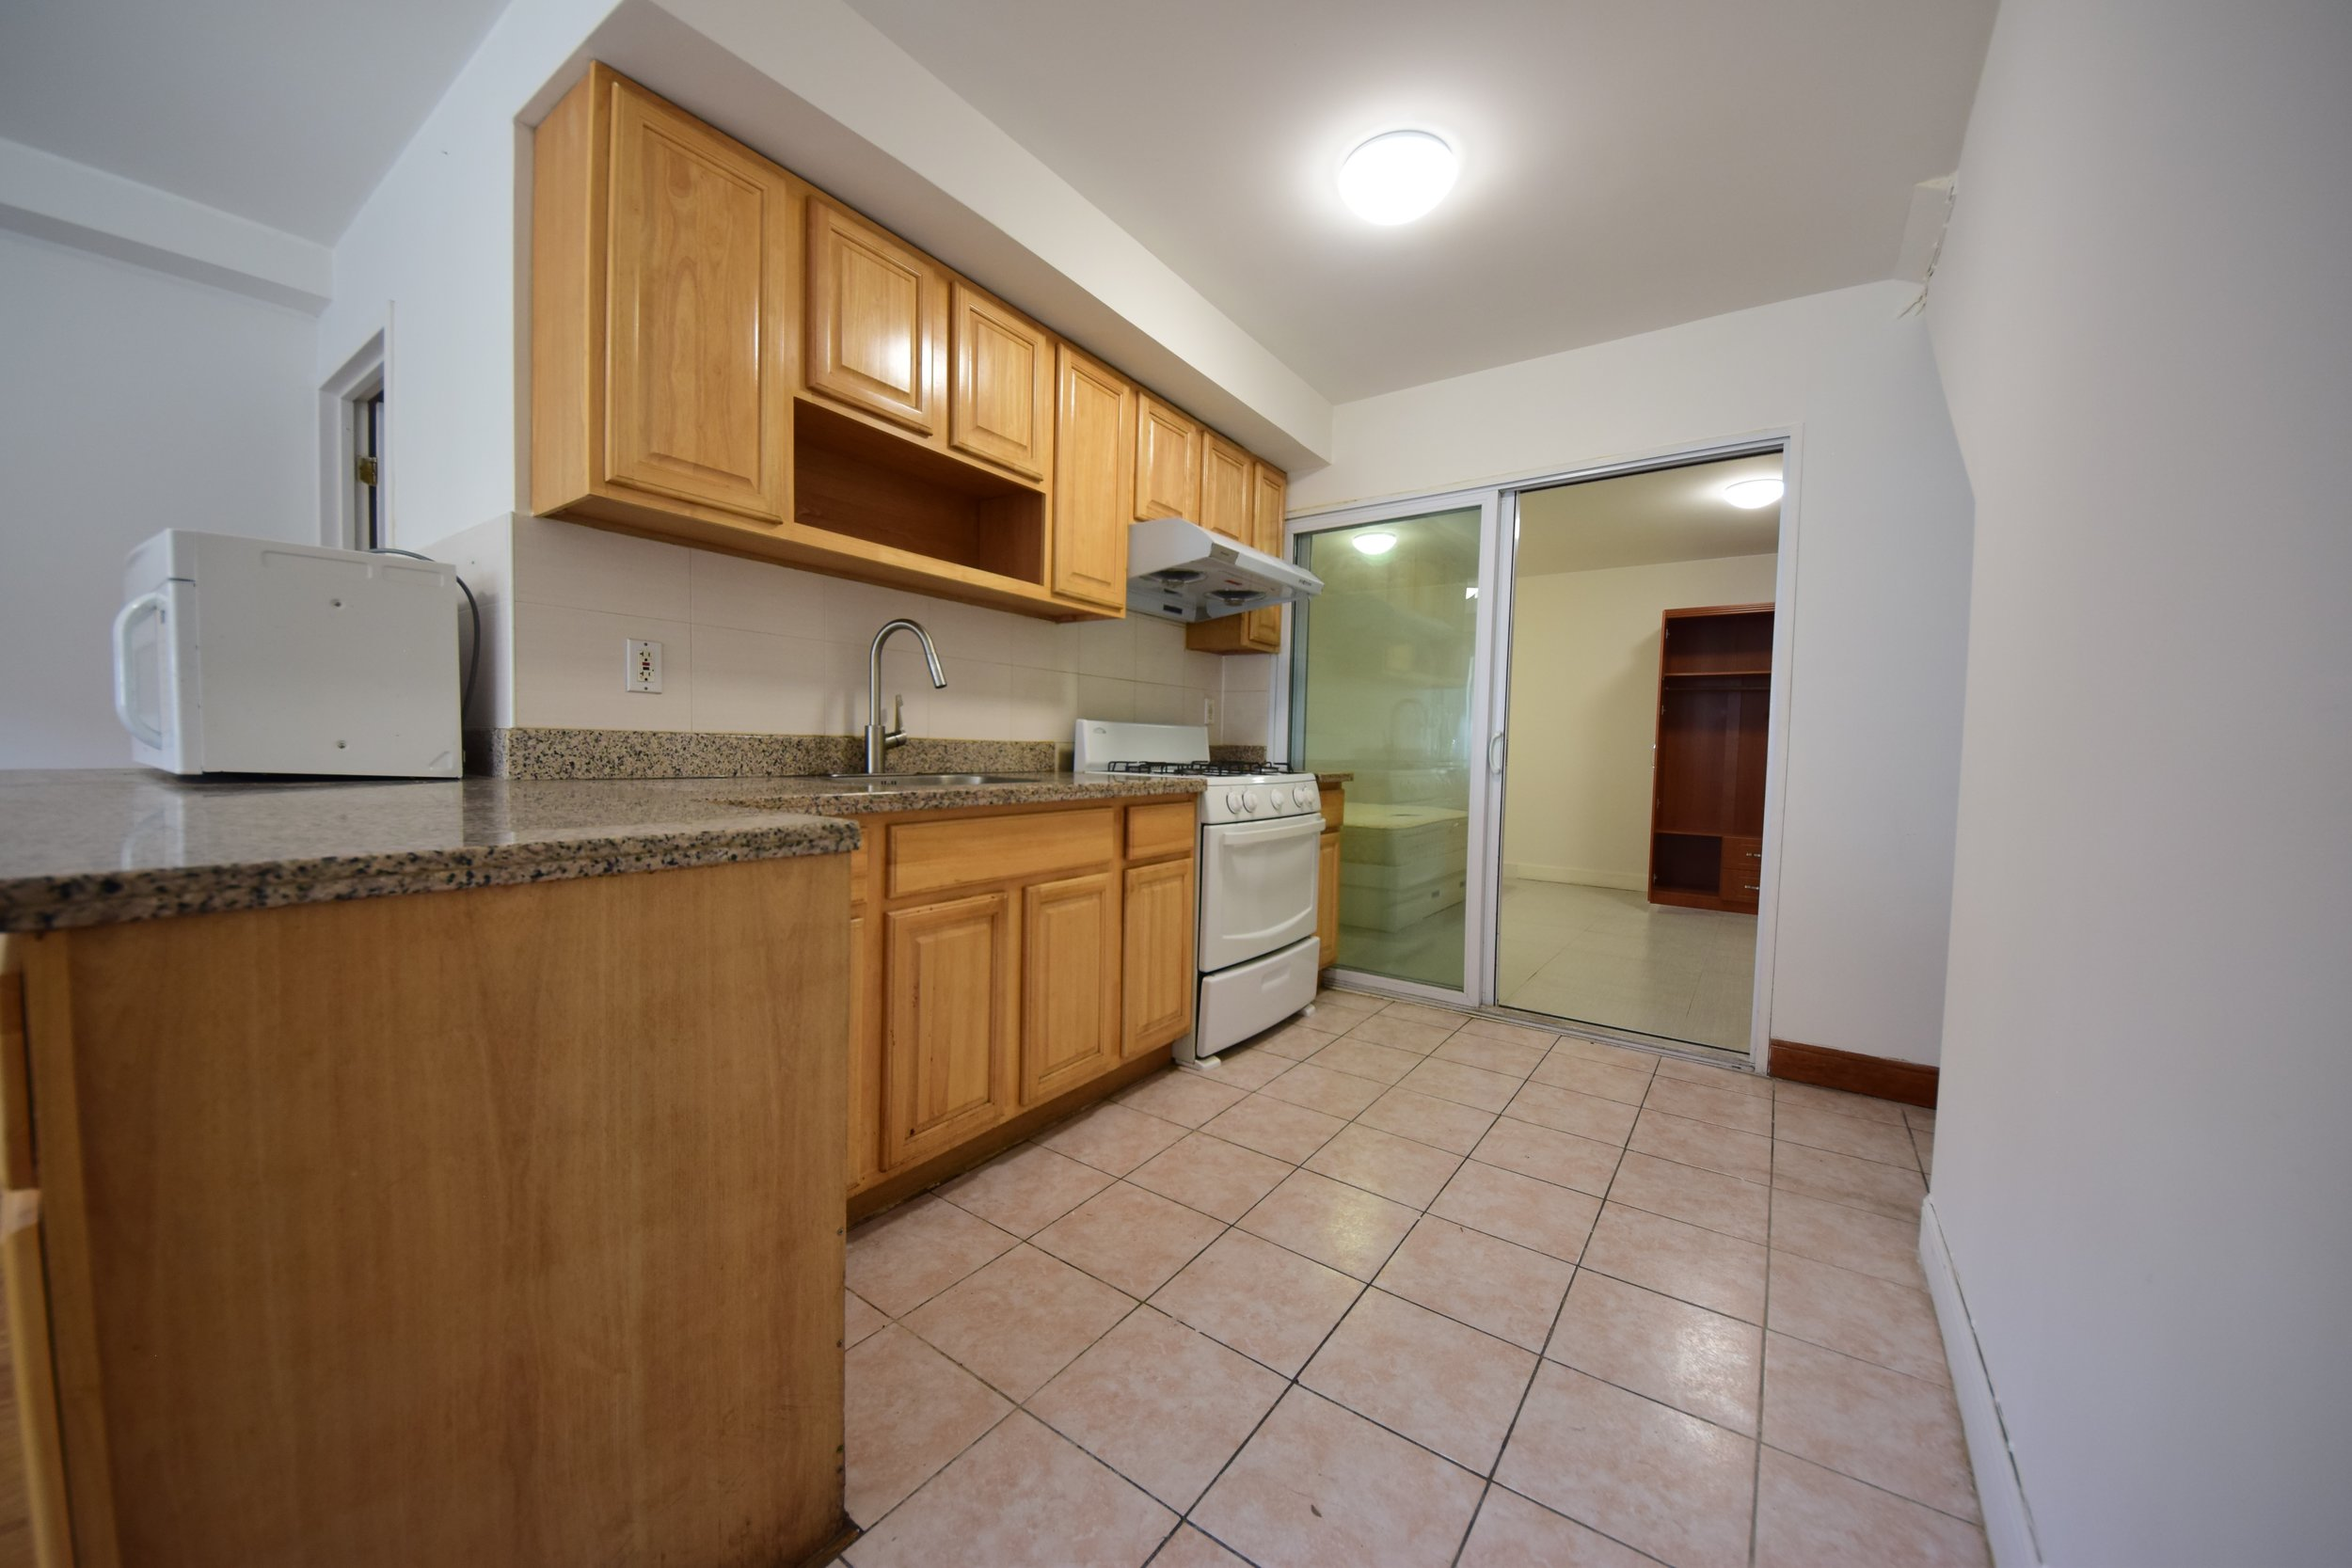 Kitchen- Small.jpg